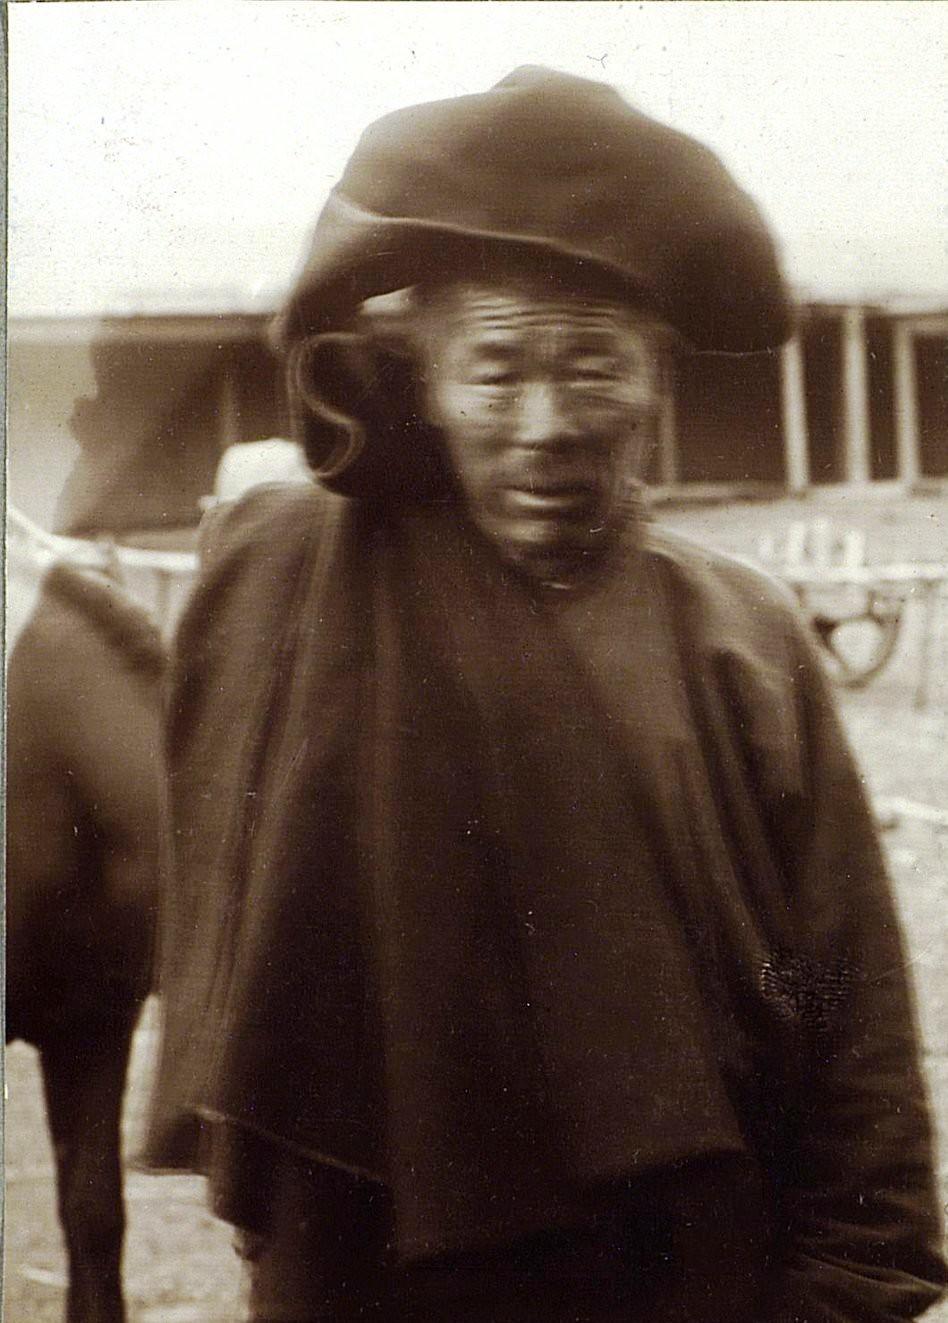 Урга. Монгол в капюшоне от дождя